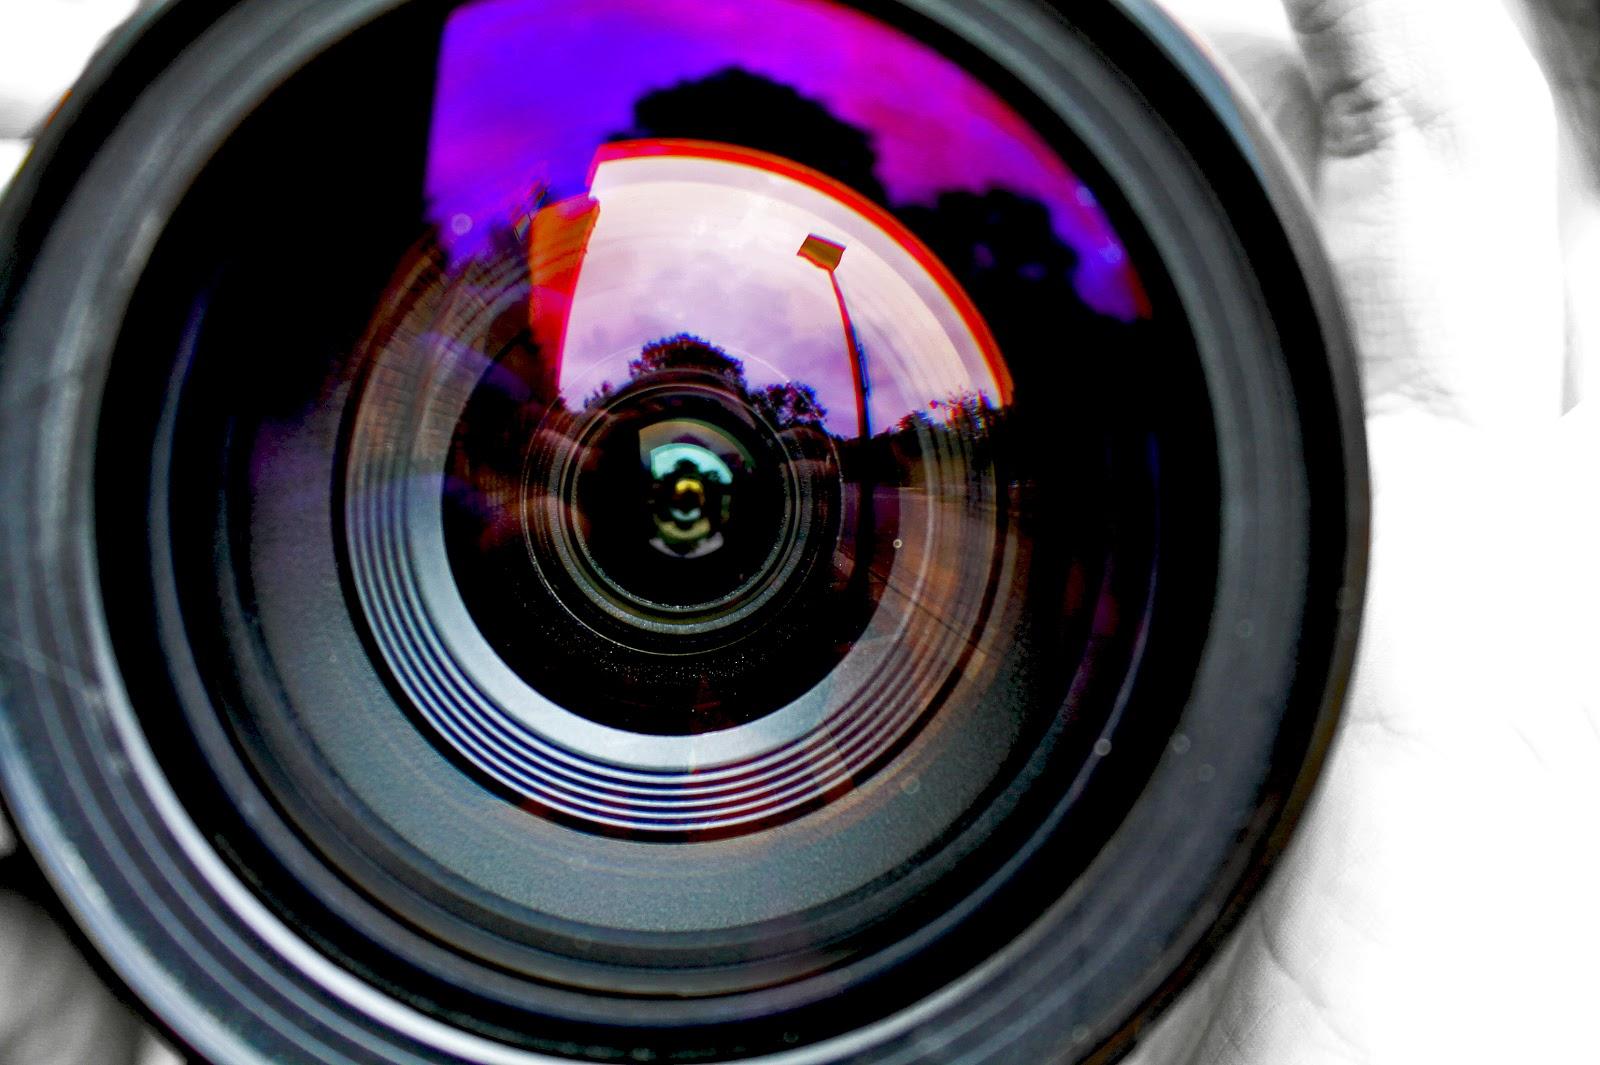 camera-lenses-wallpapers.jpg